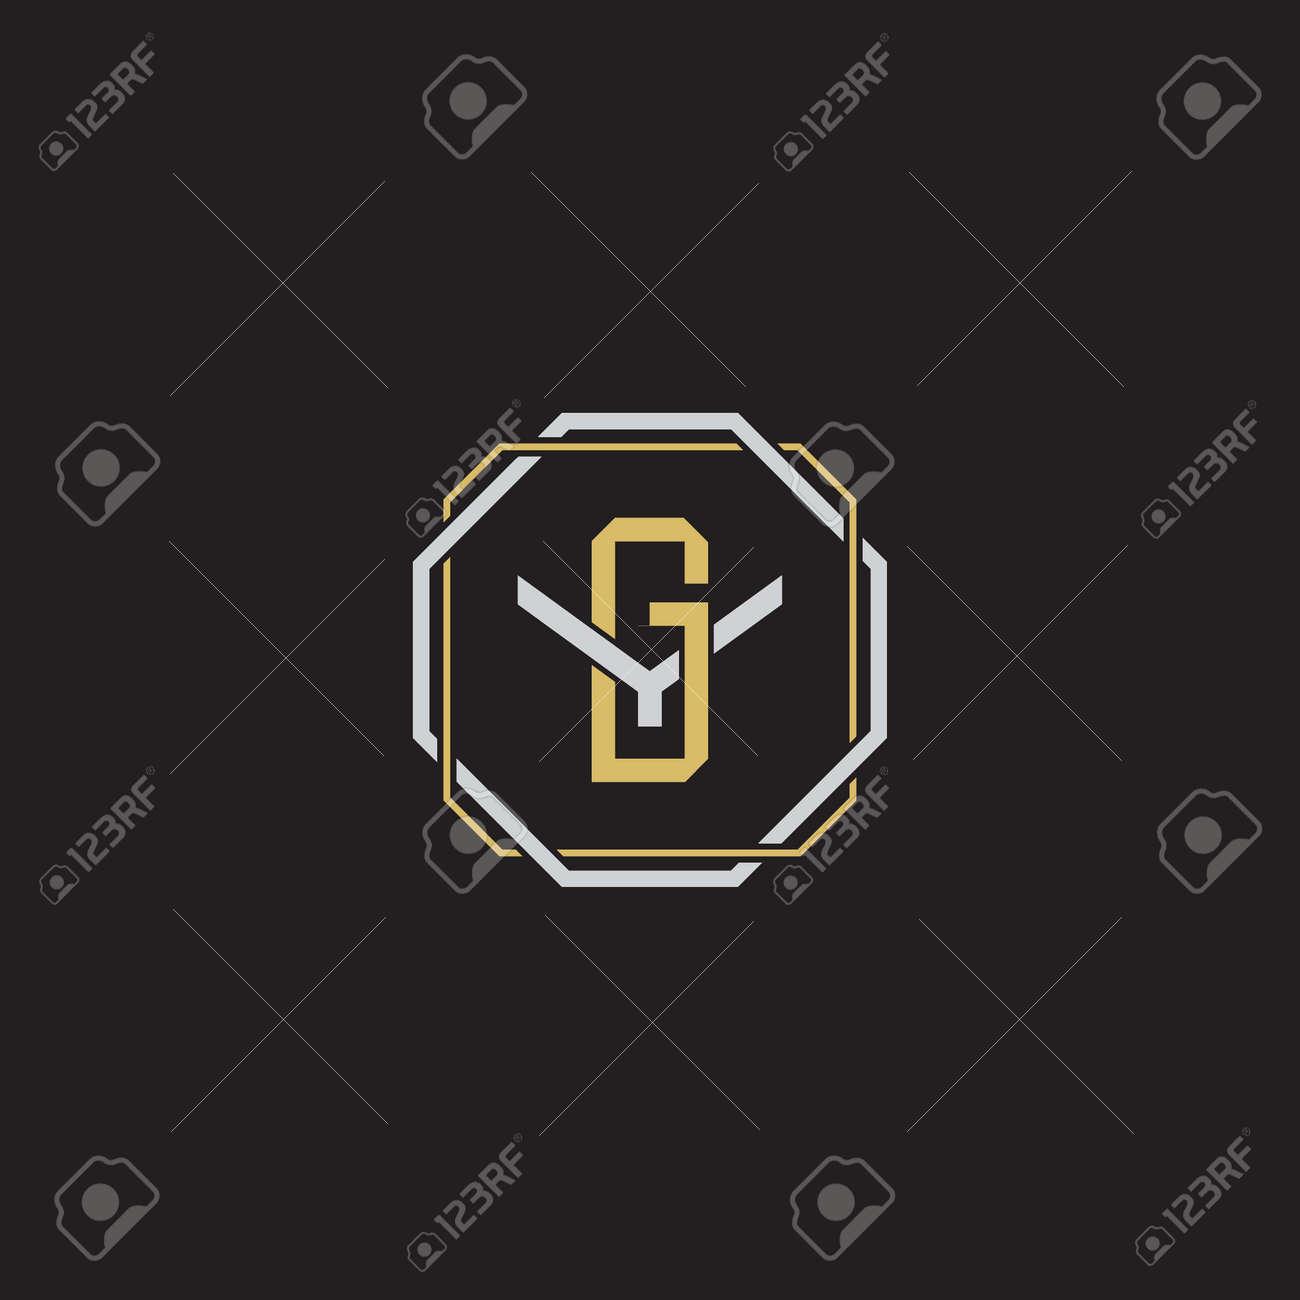 Initial letter overlapping interlock logo monogram line art style isolated on black background template - 169319732